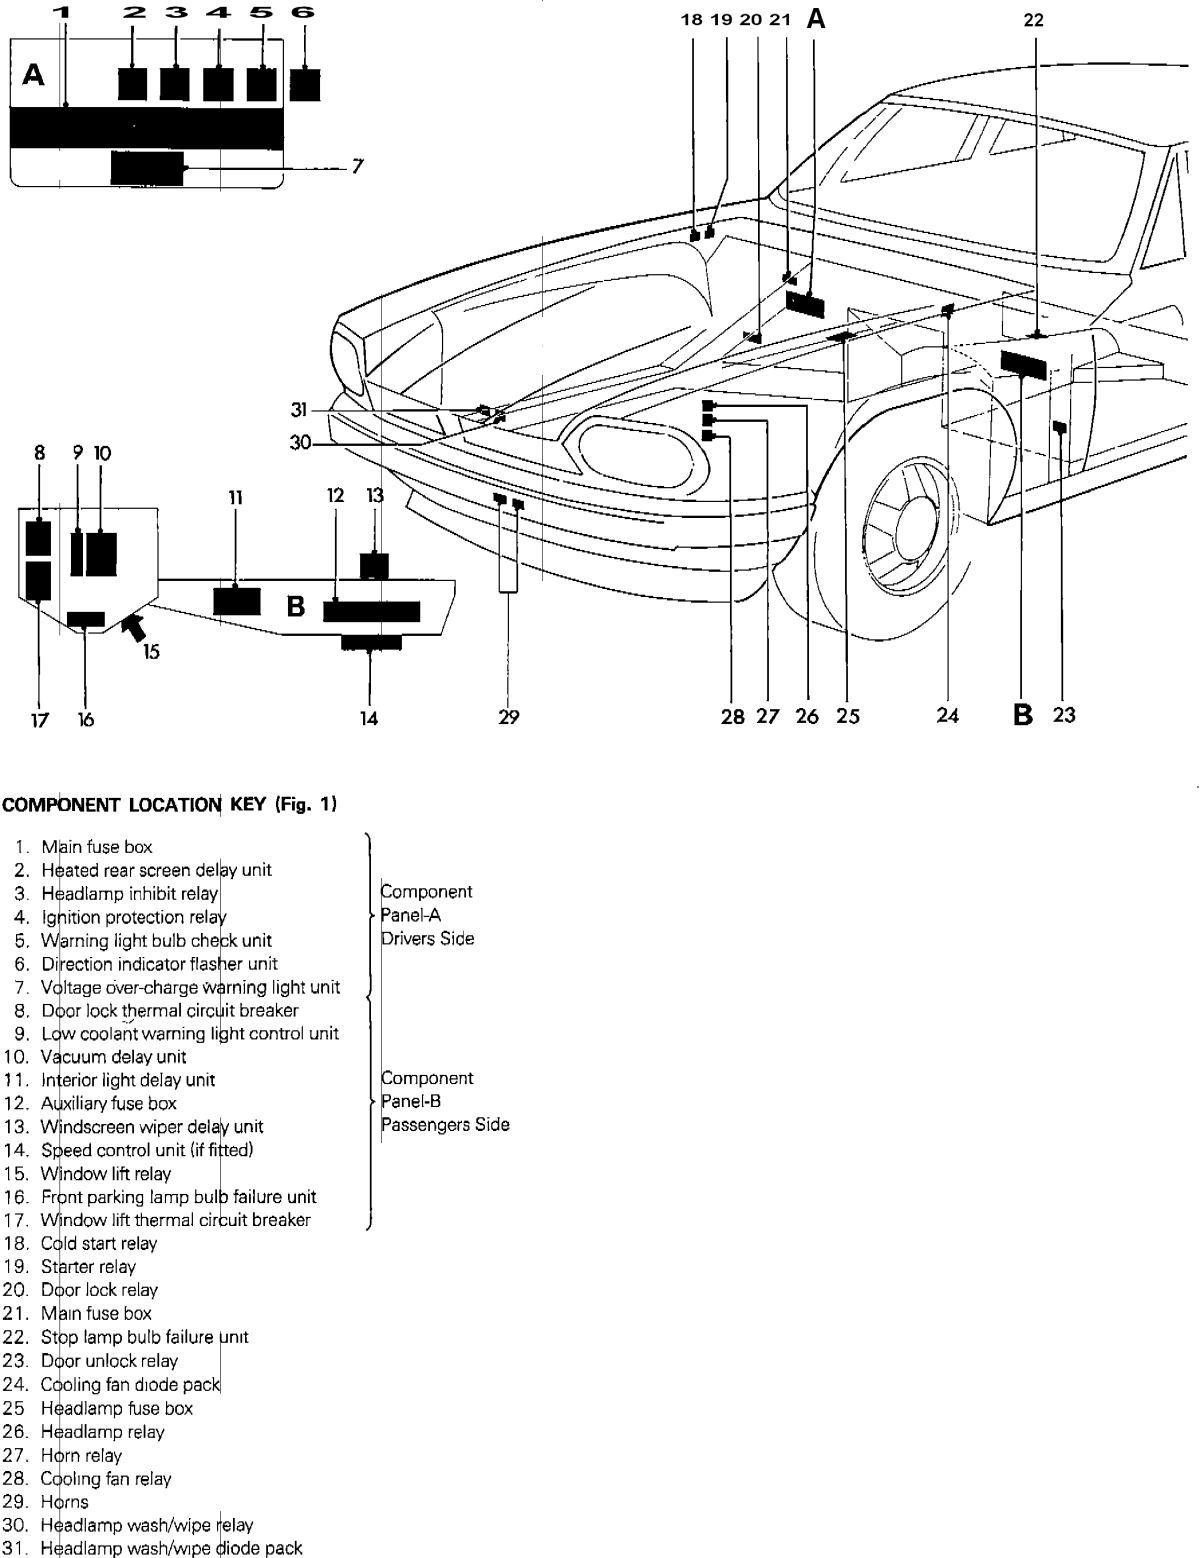 Toyota Fujitsu Ten 86100 Wiring Diagram - Wiring Diagram